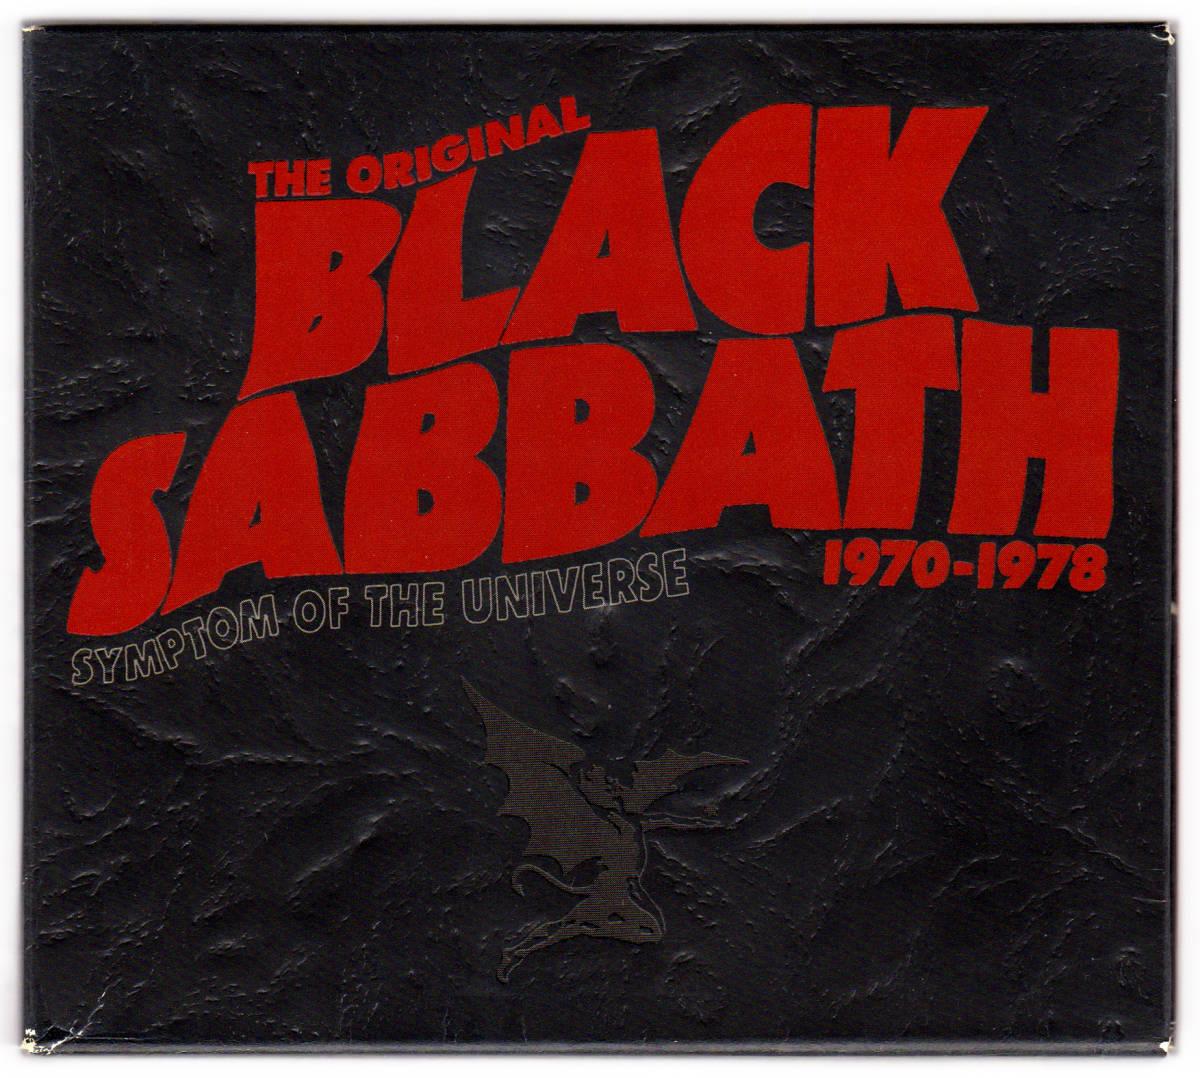 《CD US盤》 BLACK SABBATH 1970-1978 symptom of the universe 2枚組 rhinoのリマスターで出た選曲・音質とも評価の高い傑作ベスト